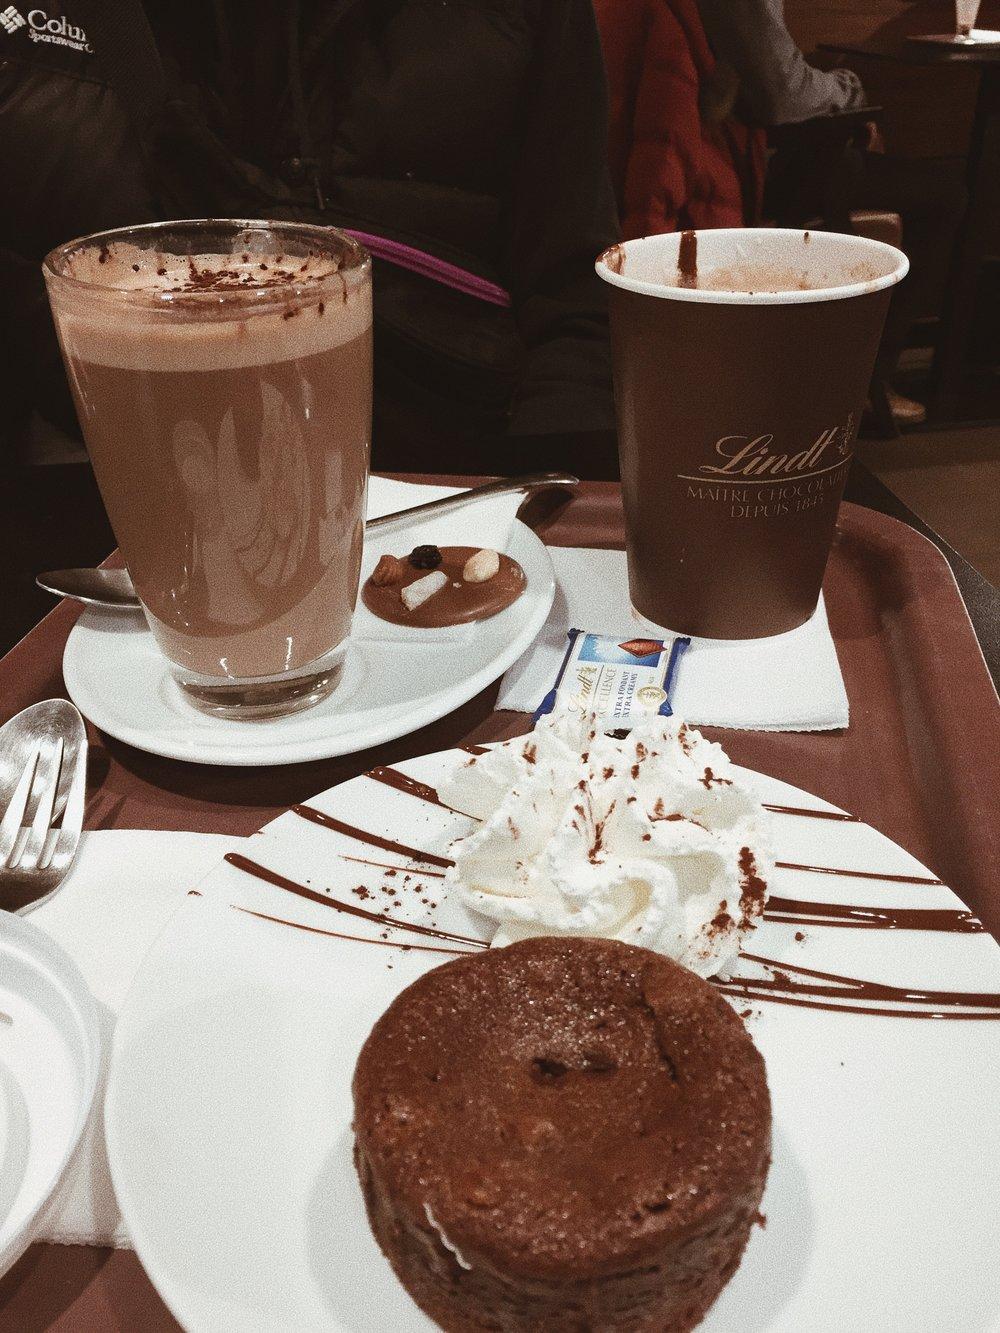 lindtt_hotchocolate_dessert_paris_france_food_travelguide